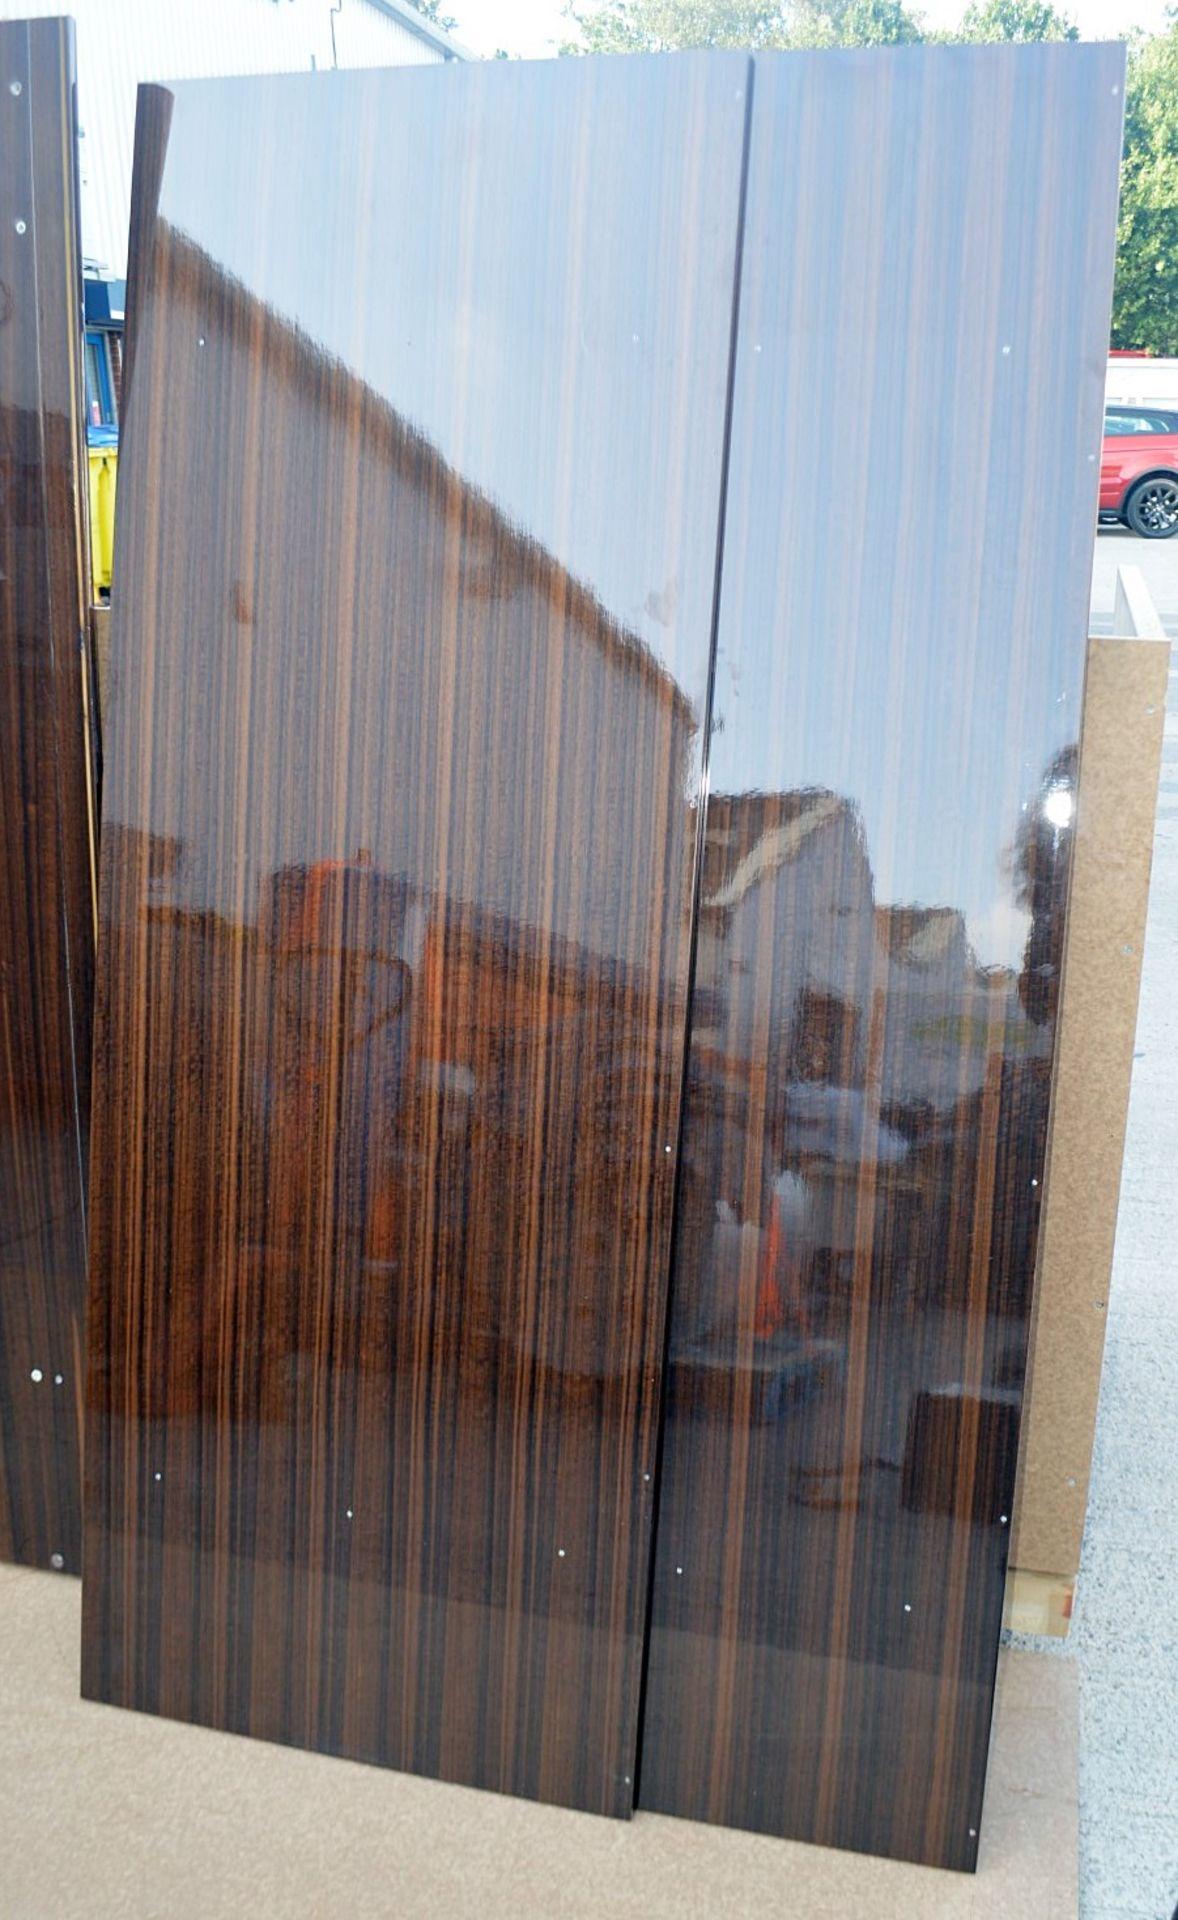 1 x FRATO Bespoke 'Siena' Wardrobe With A High Gloss Brown Wood Veneer Finish - Original RRP £18,890 - Image 12 of 21